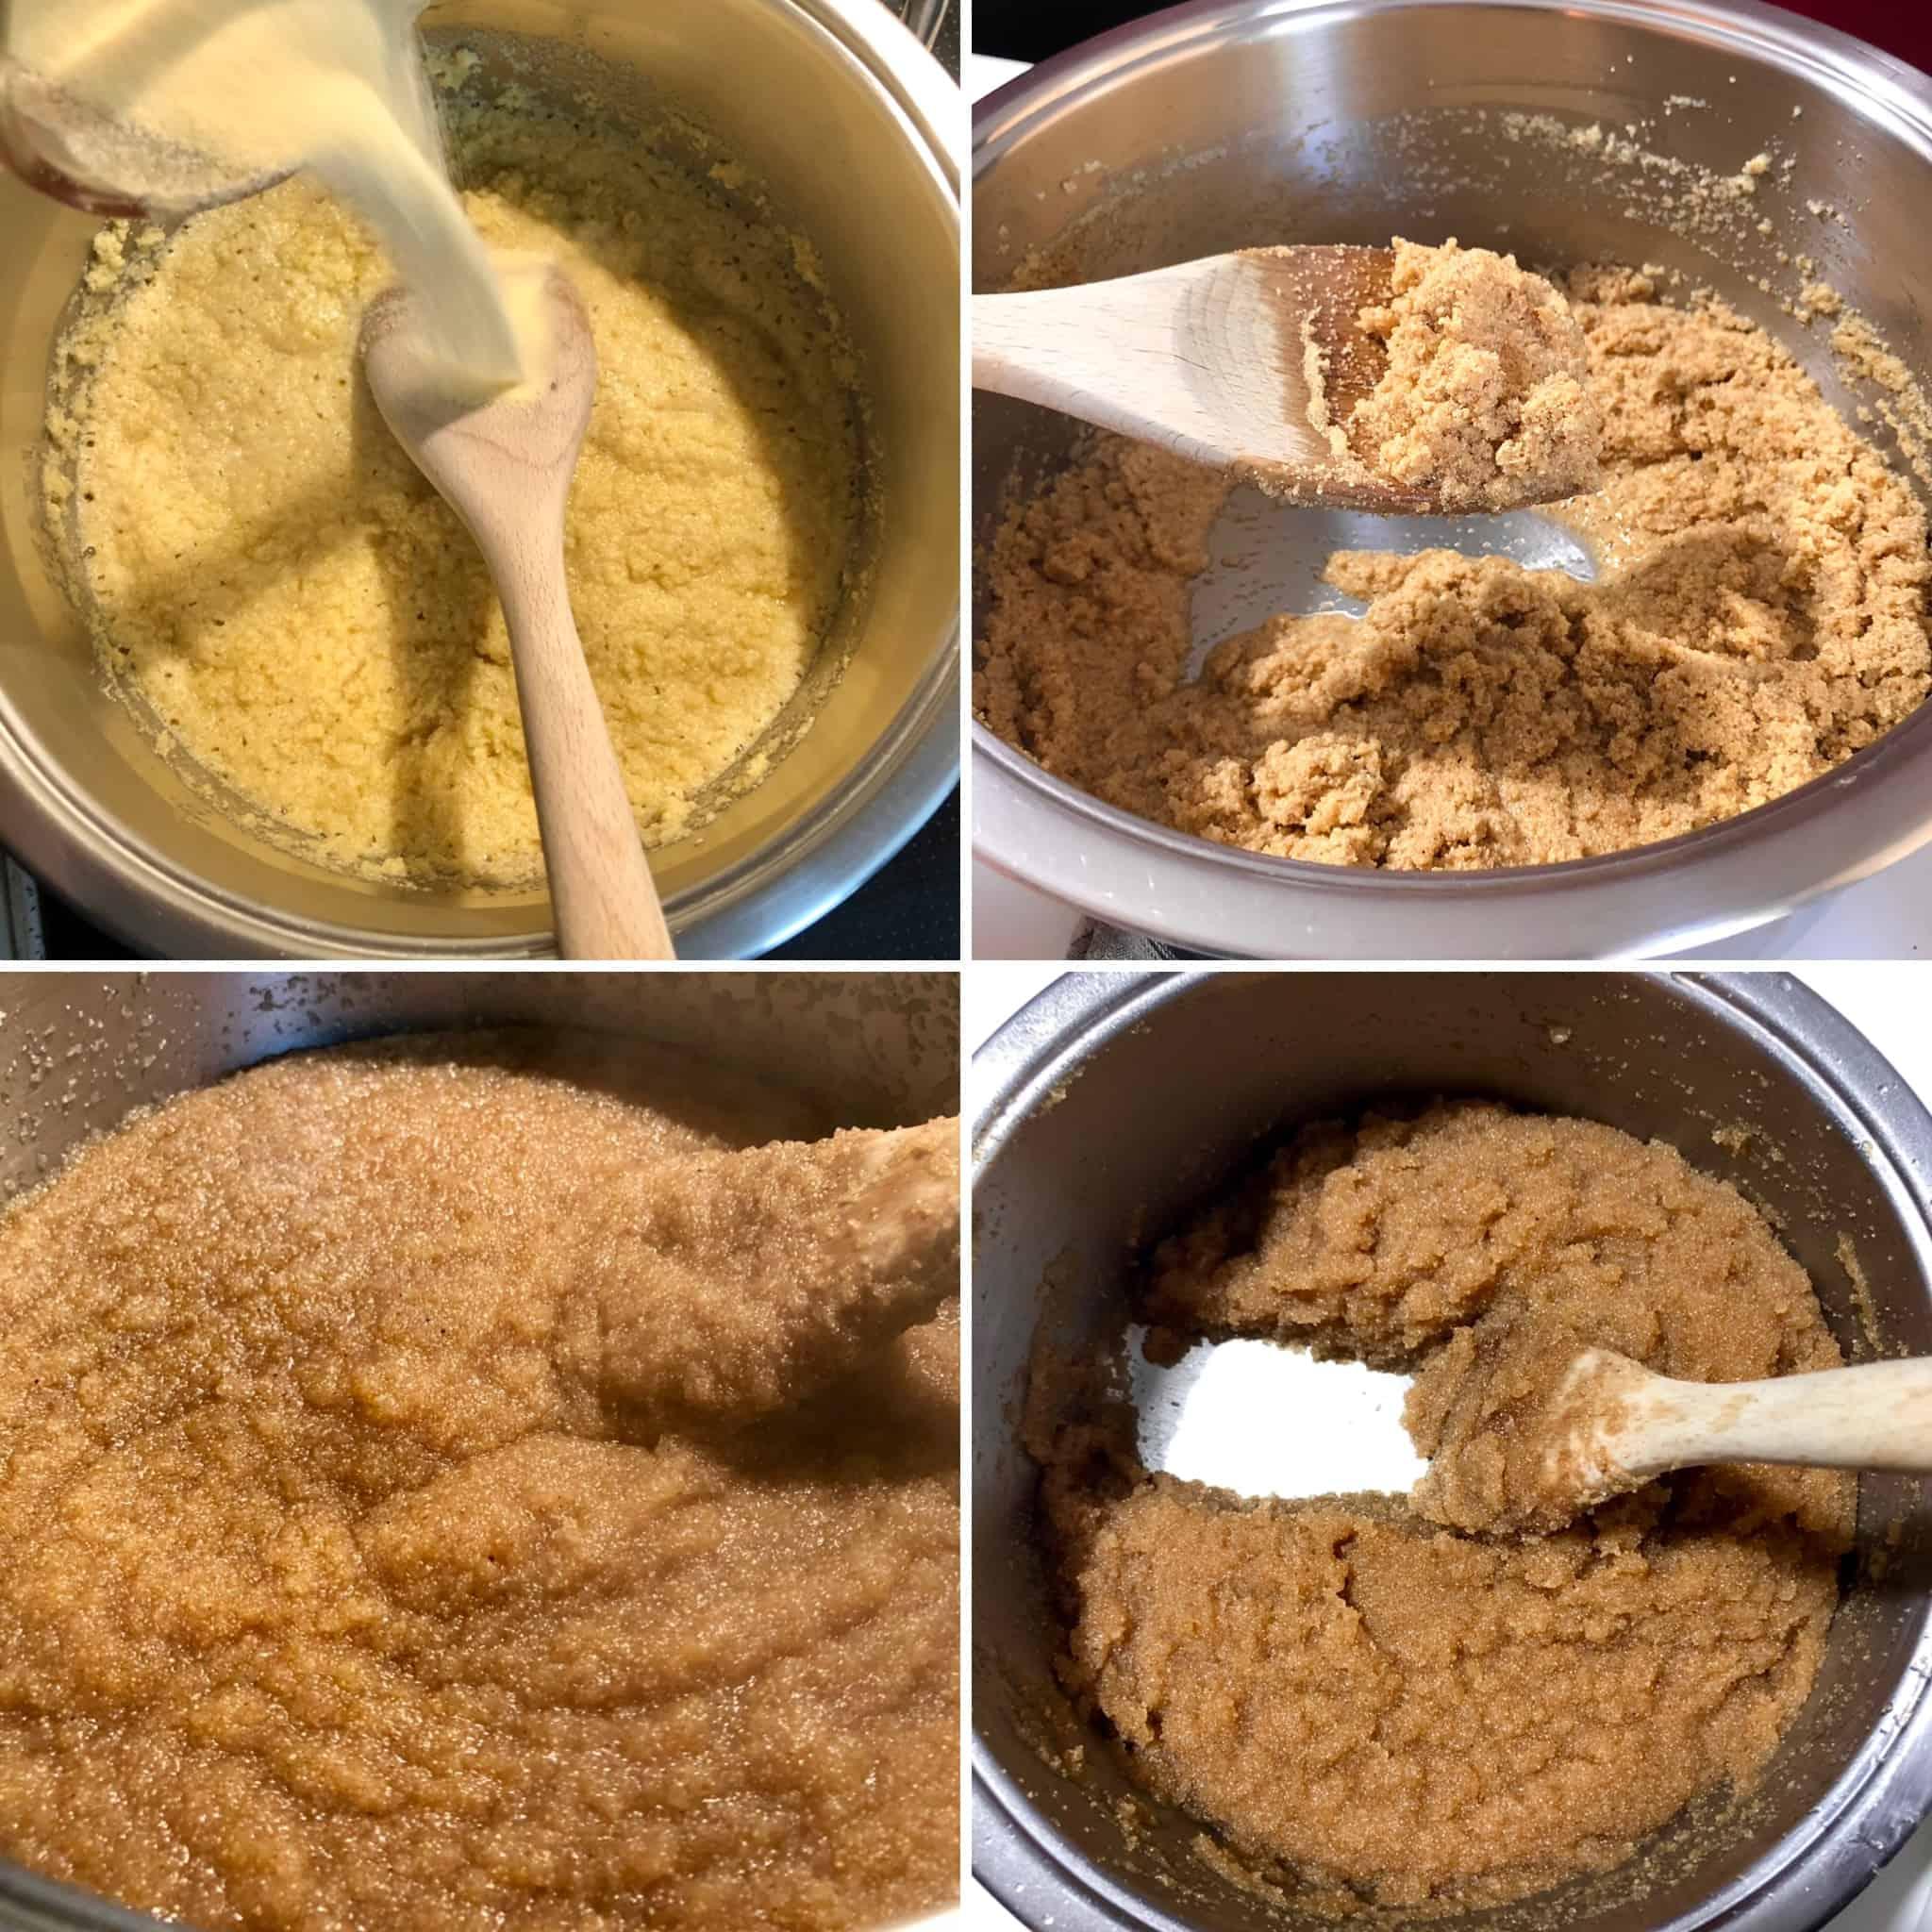 Greek Halva recipe preparation